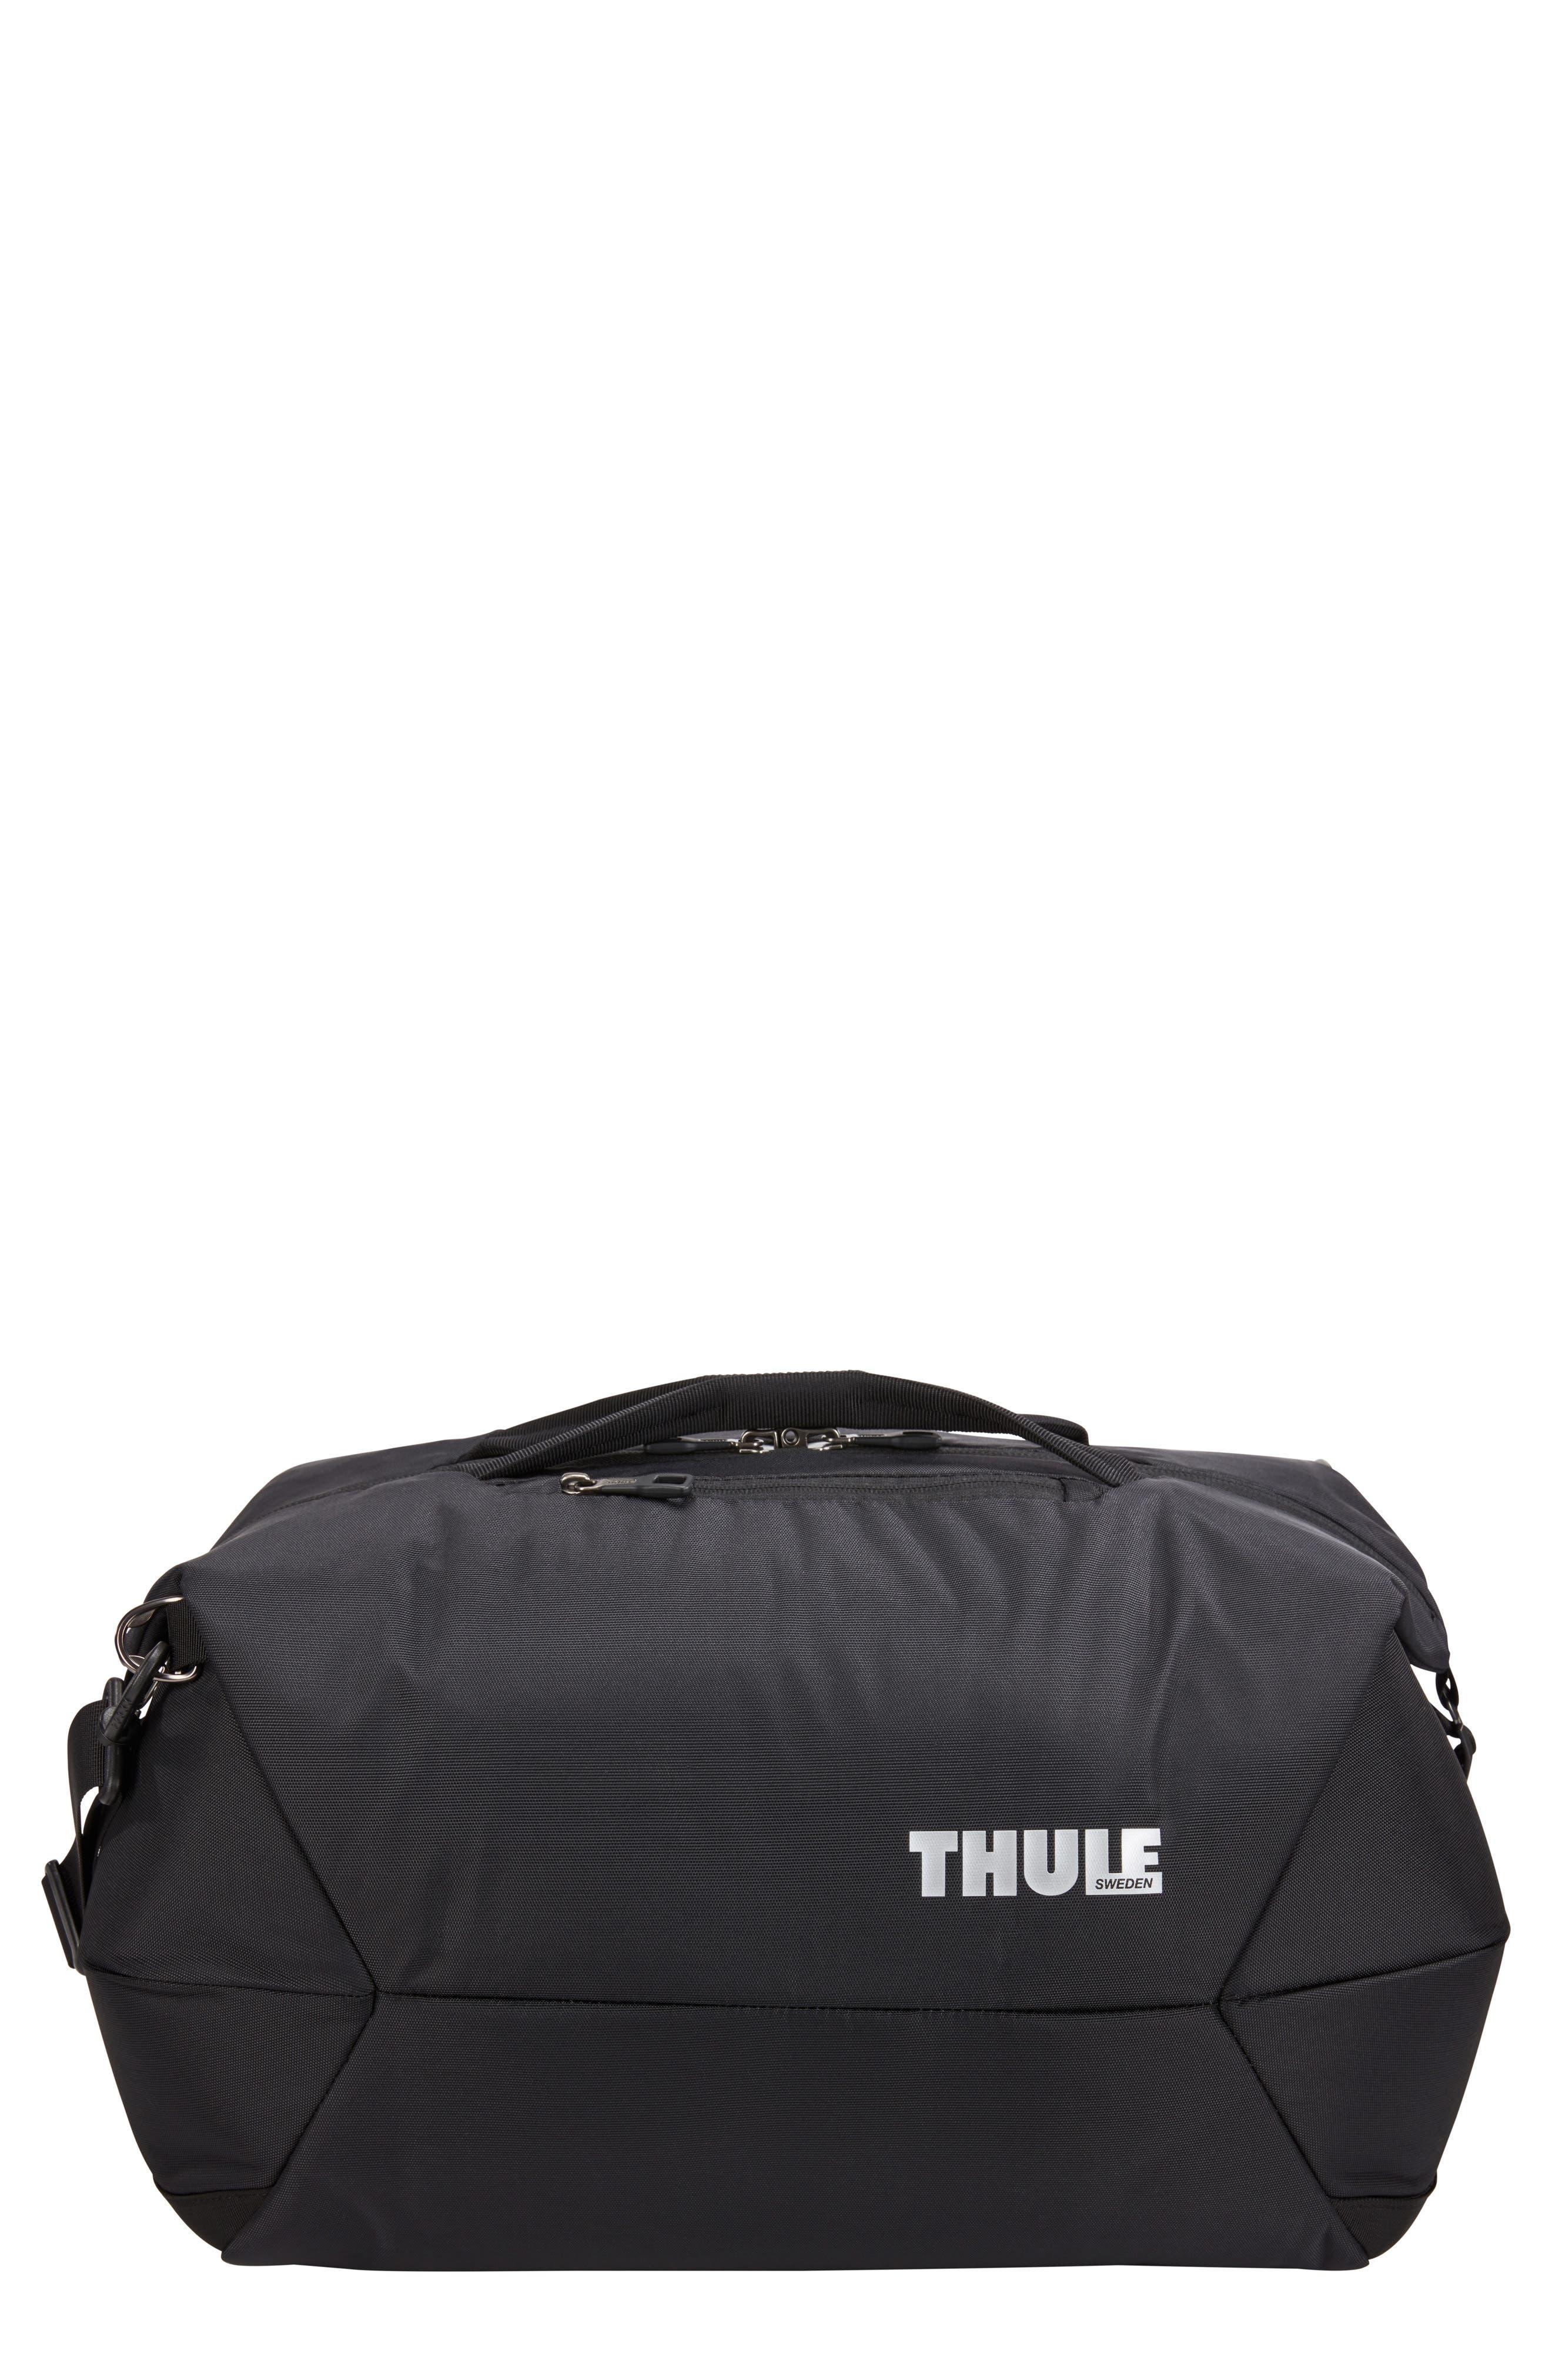 Thule Subterra 45-Liter Duffle Bag